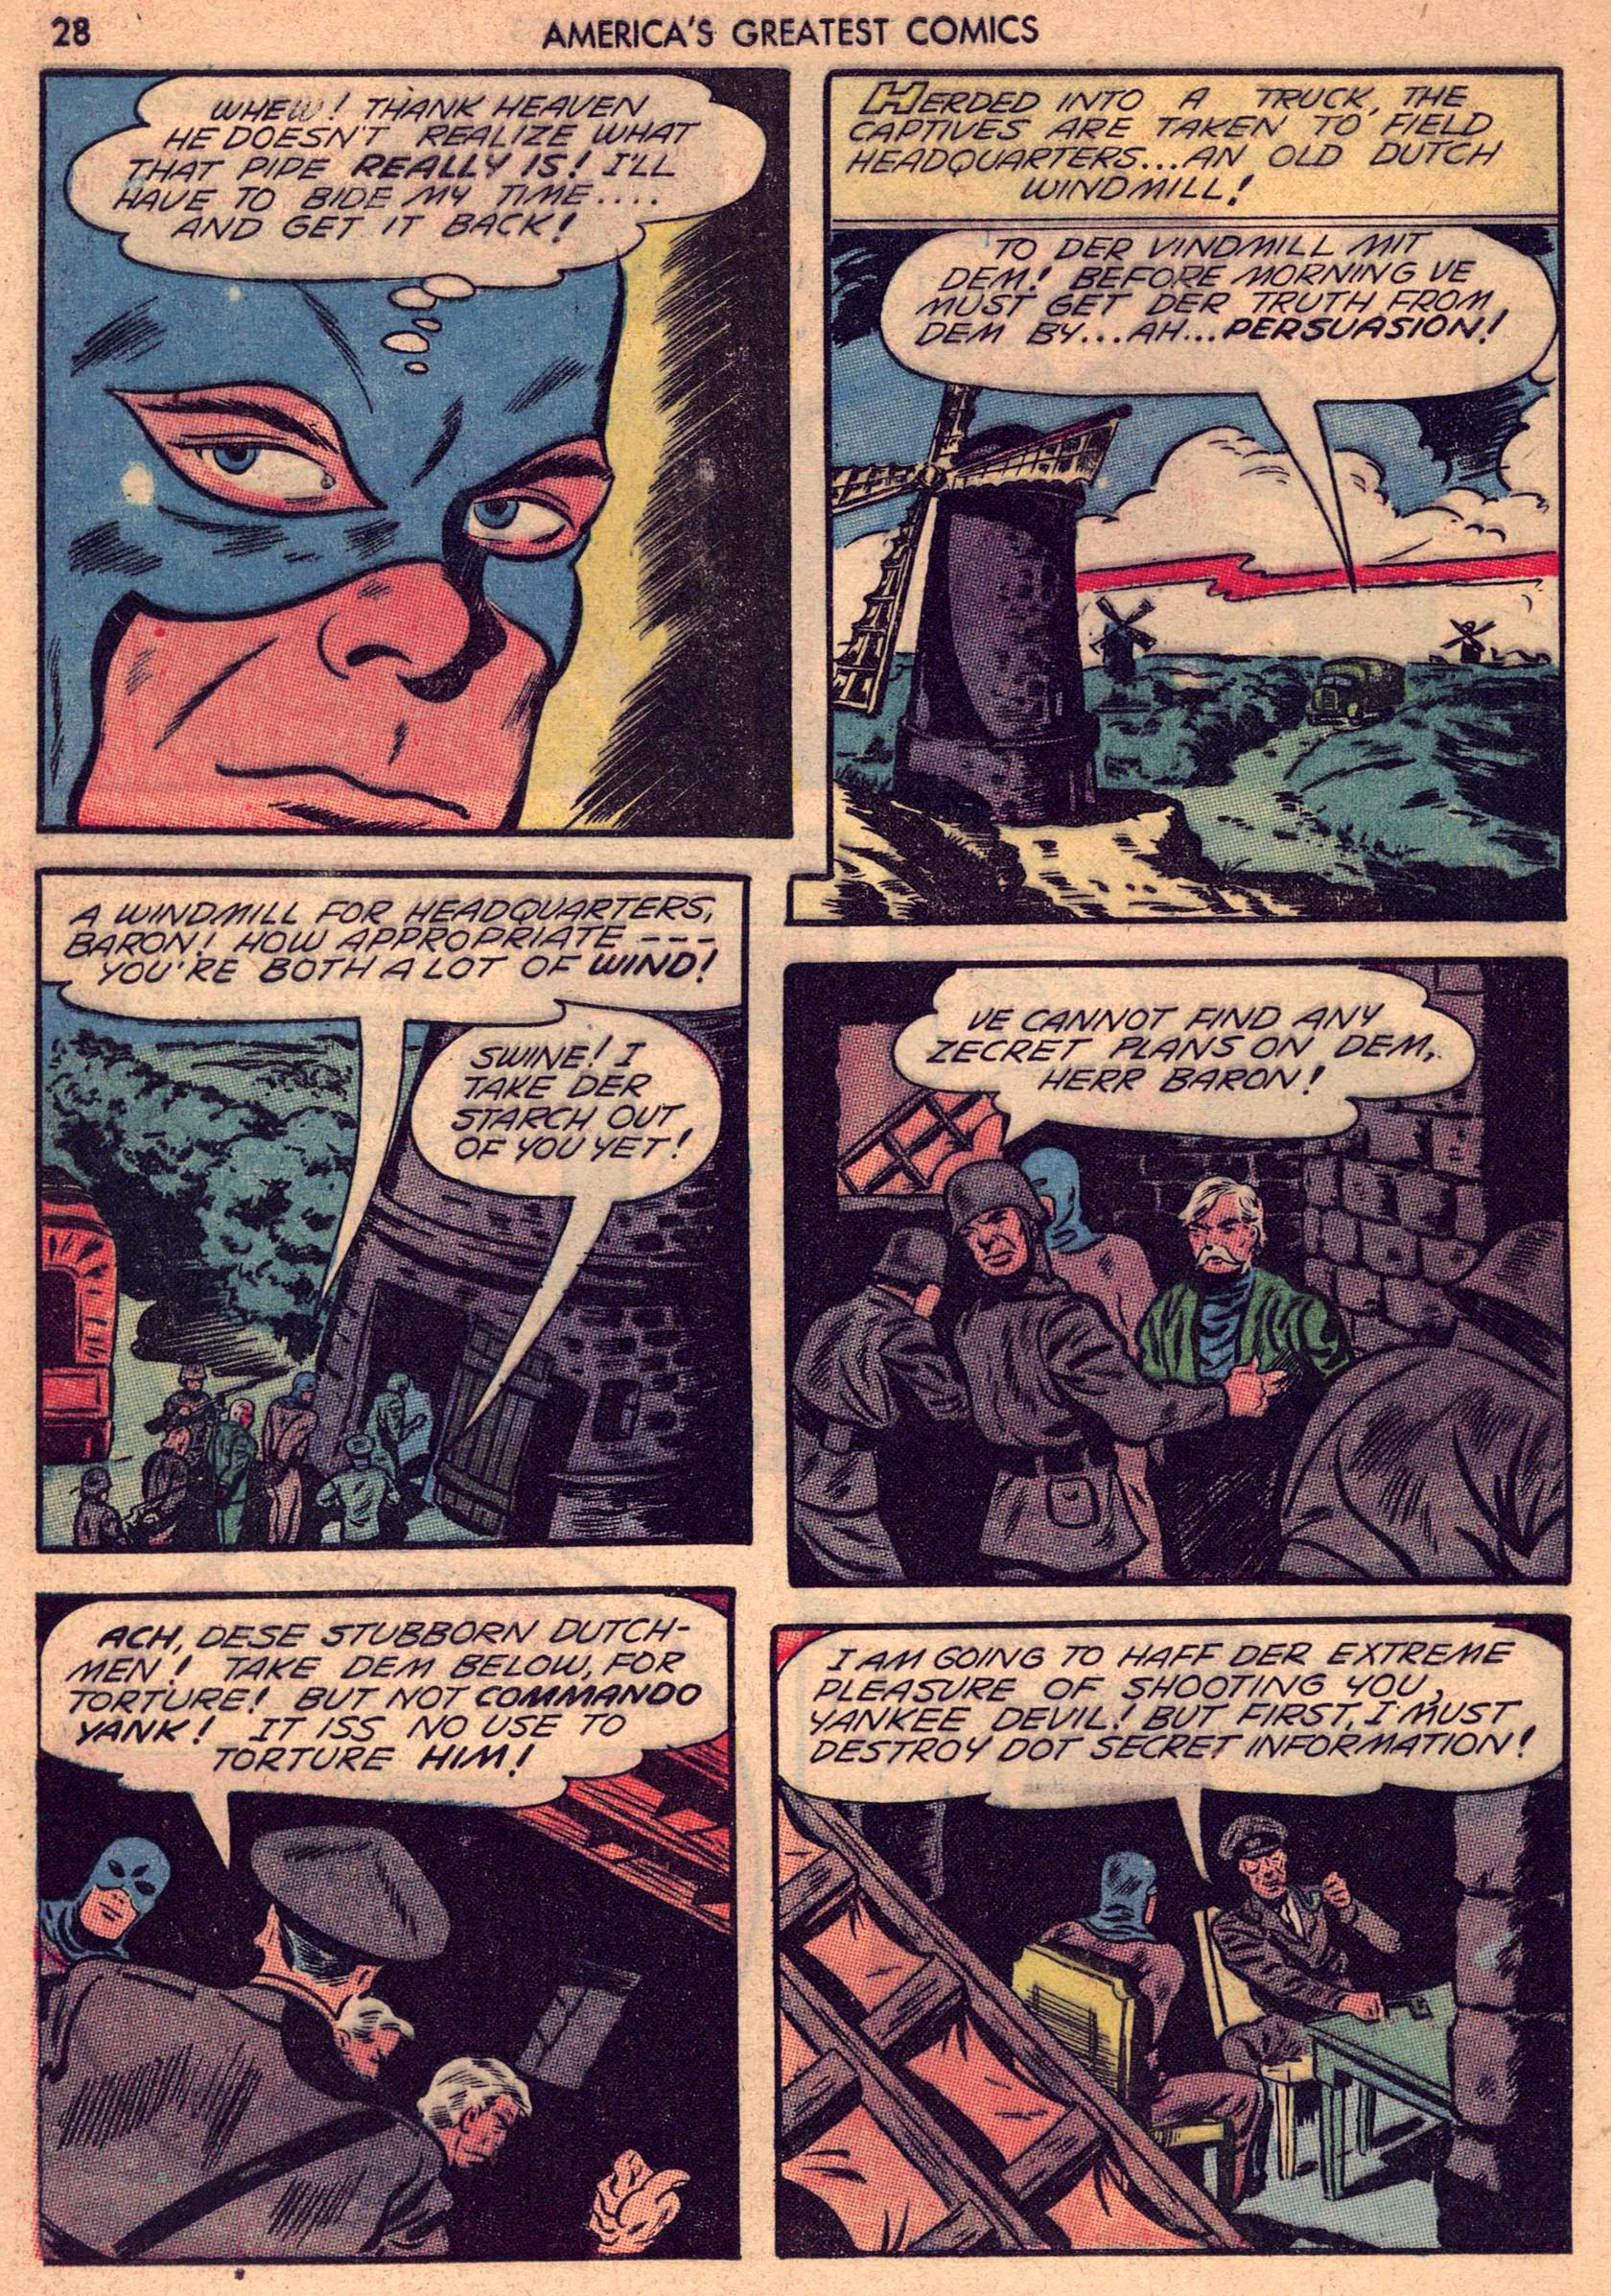 Read online America's Greatest Comics comic -  Issue #7 - 27